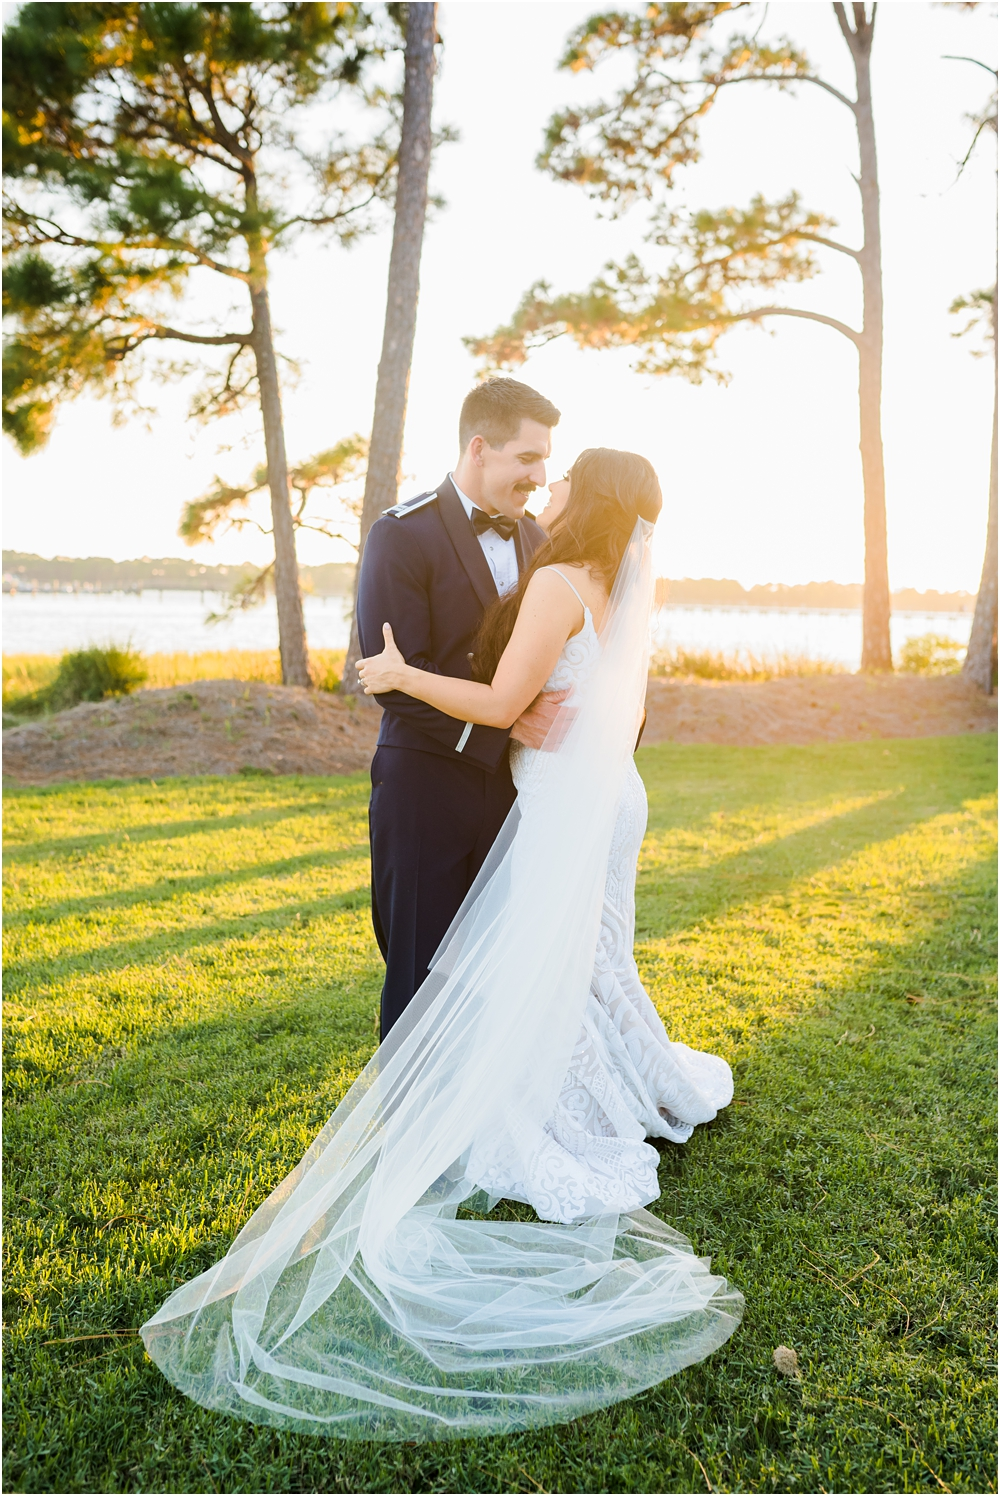 amack-wedding-kiersten-stevenson-photography-30a-panama-city-beach-dothan-tallahassee-(517-of-882).JPG